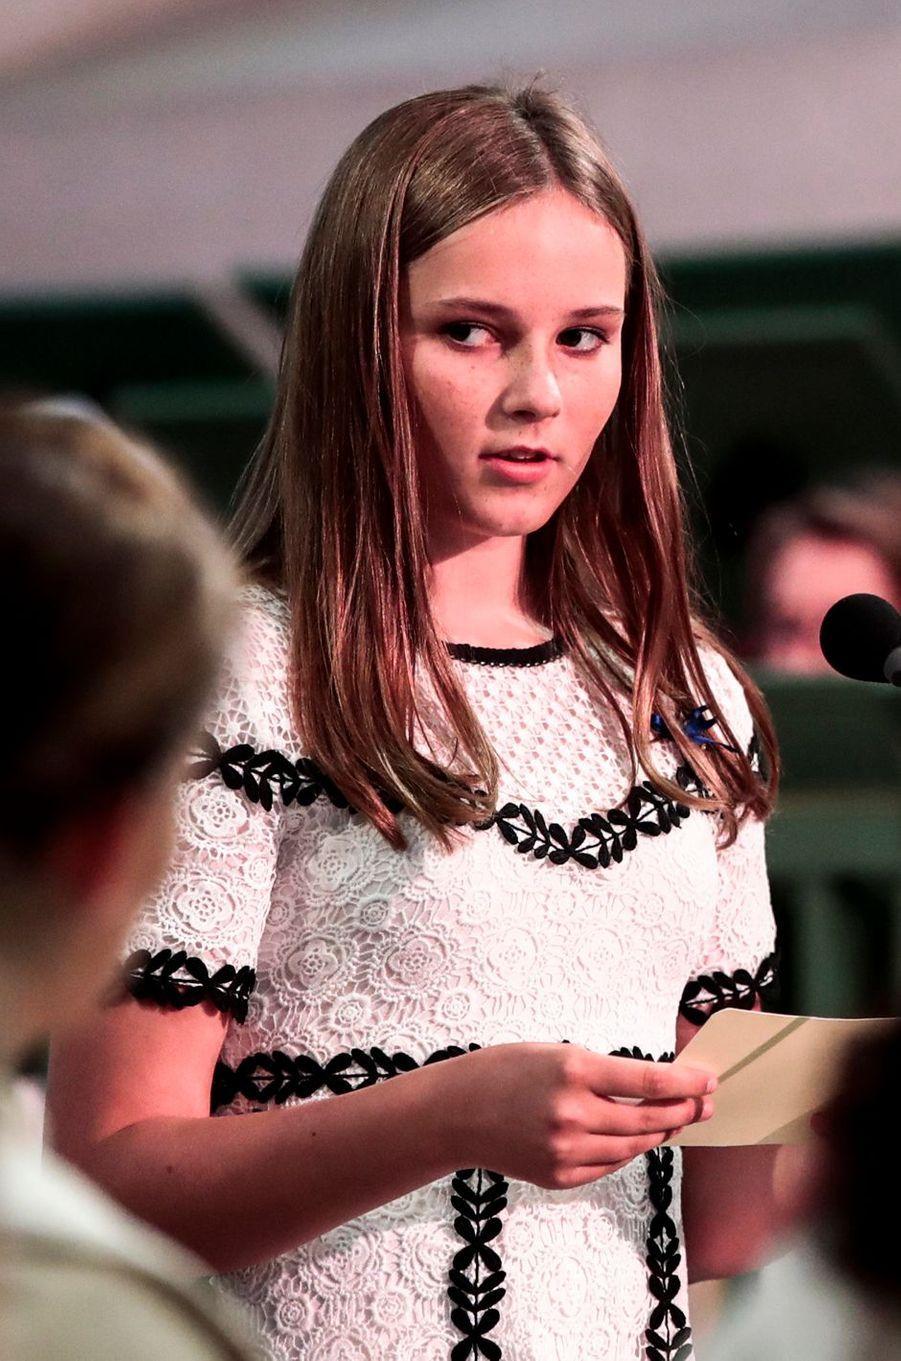 La princesse Ingrid Alexandra de Norvège à Oslo, le 29 août 2018